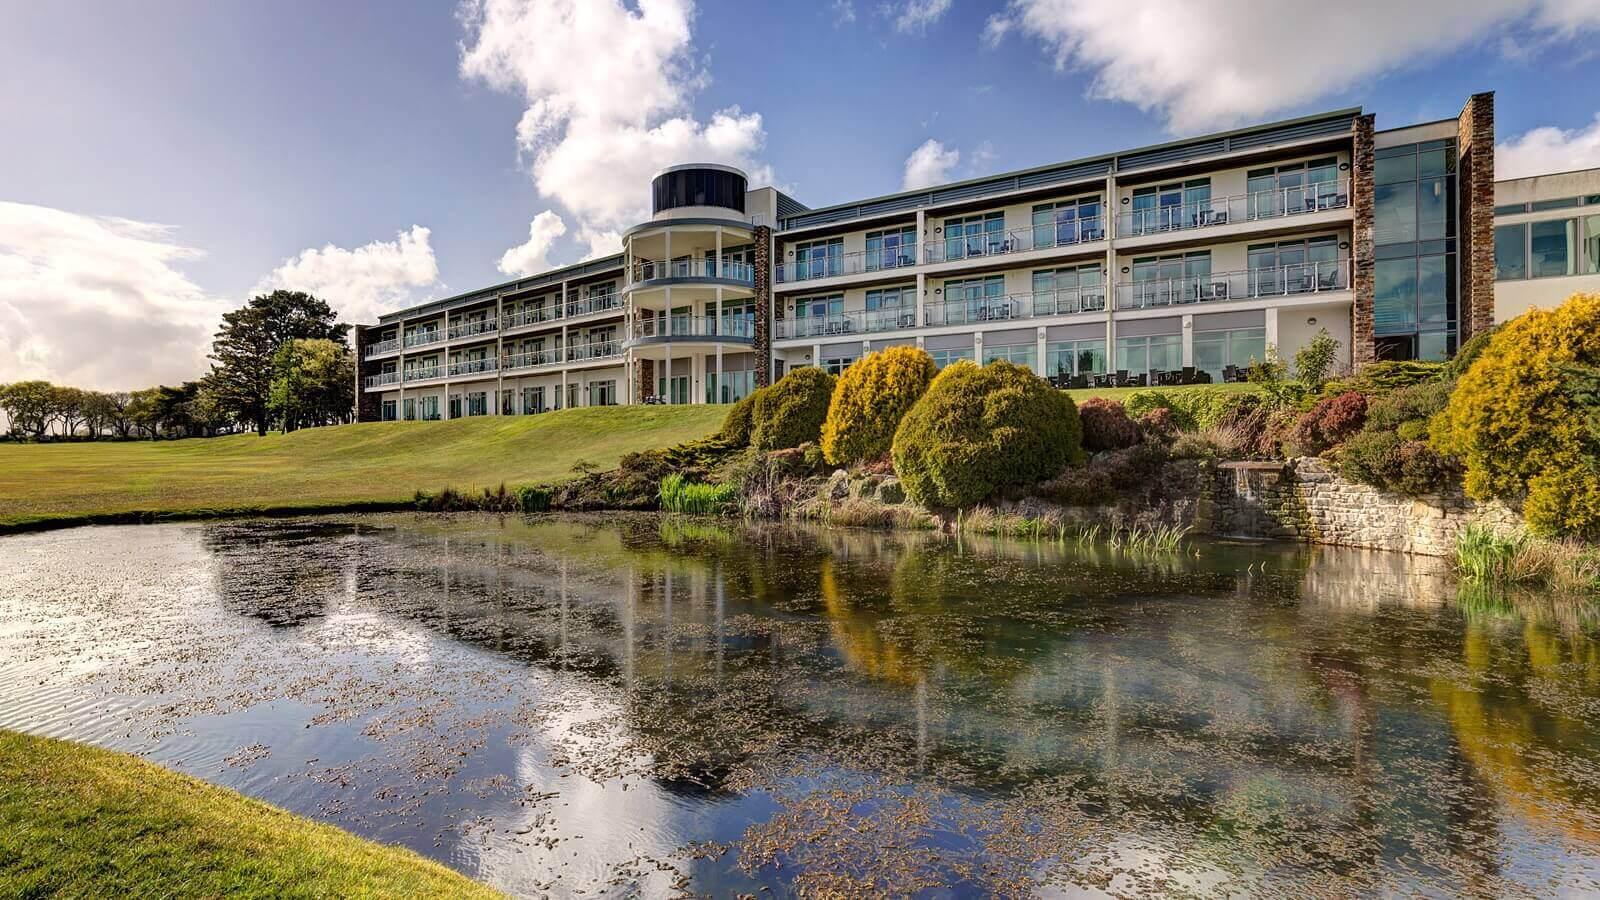 St Mellion Hotel Pond